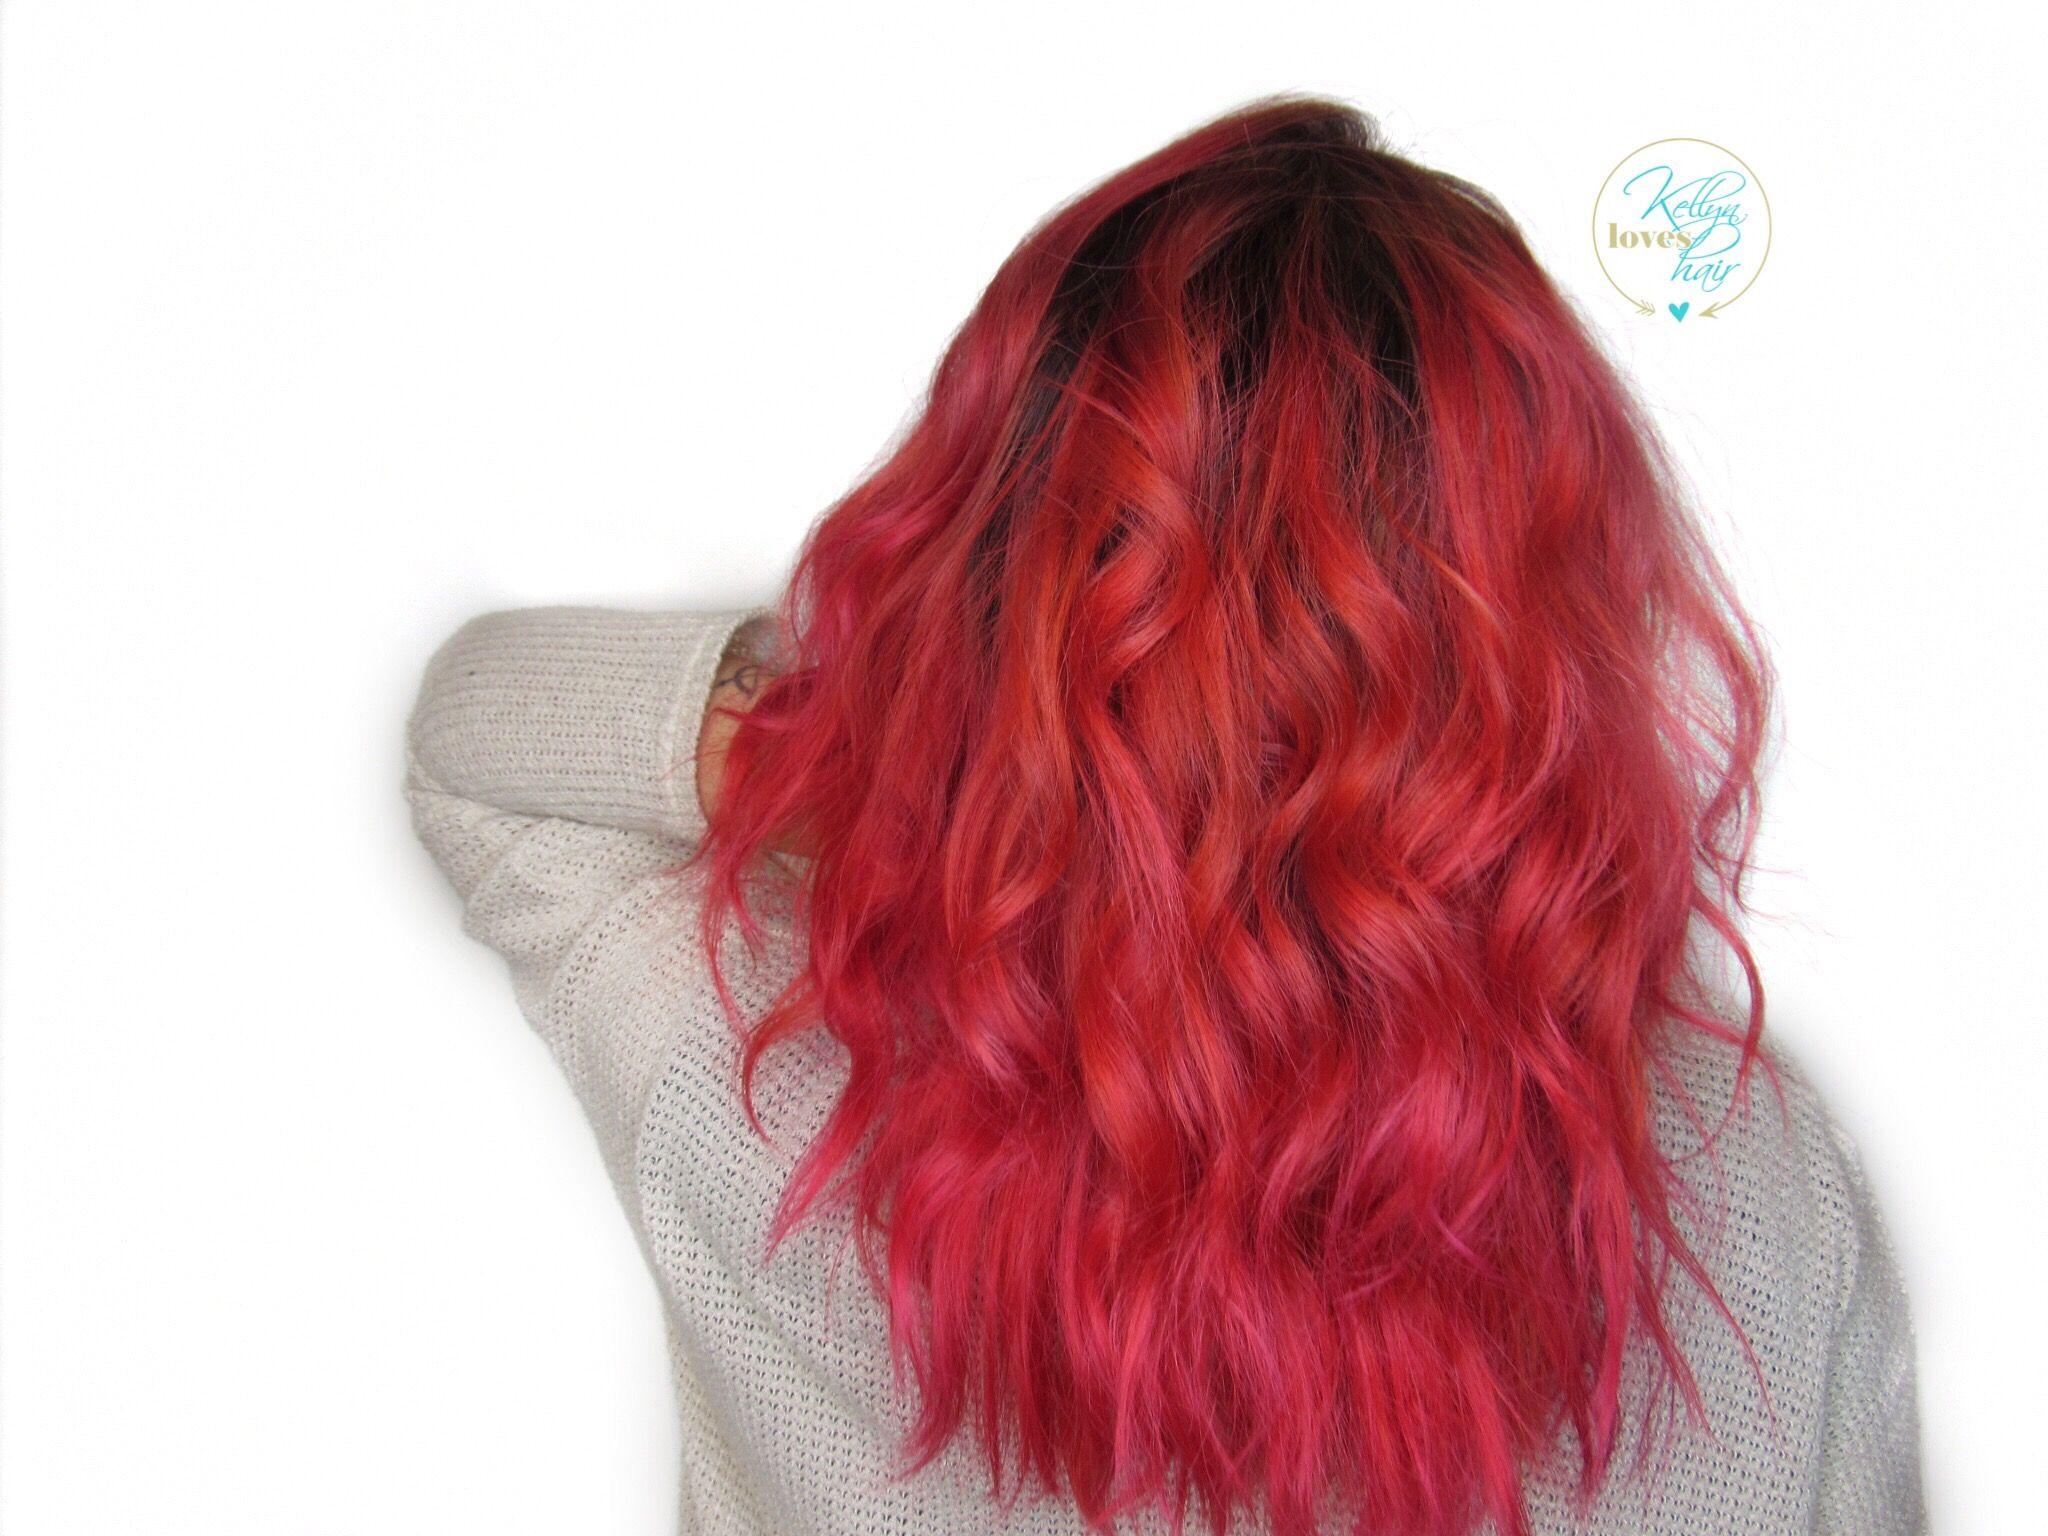 Arctic Fox Hair Color Meganpaigemua Just Peachy I Mixed Arcticfoxhaircolor Porange And Electric Par Peachy Pink Hair Coral Hair Color Peach Hair